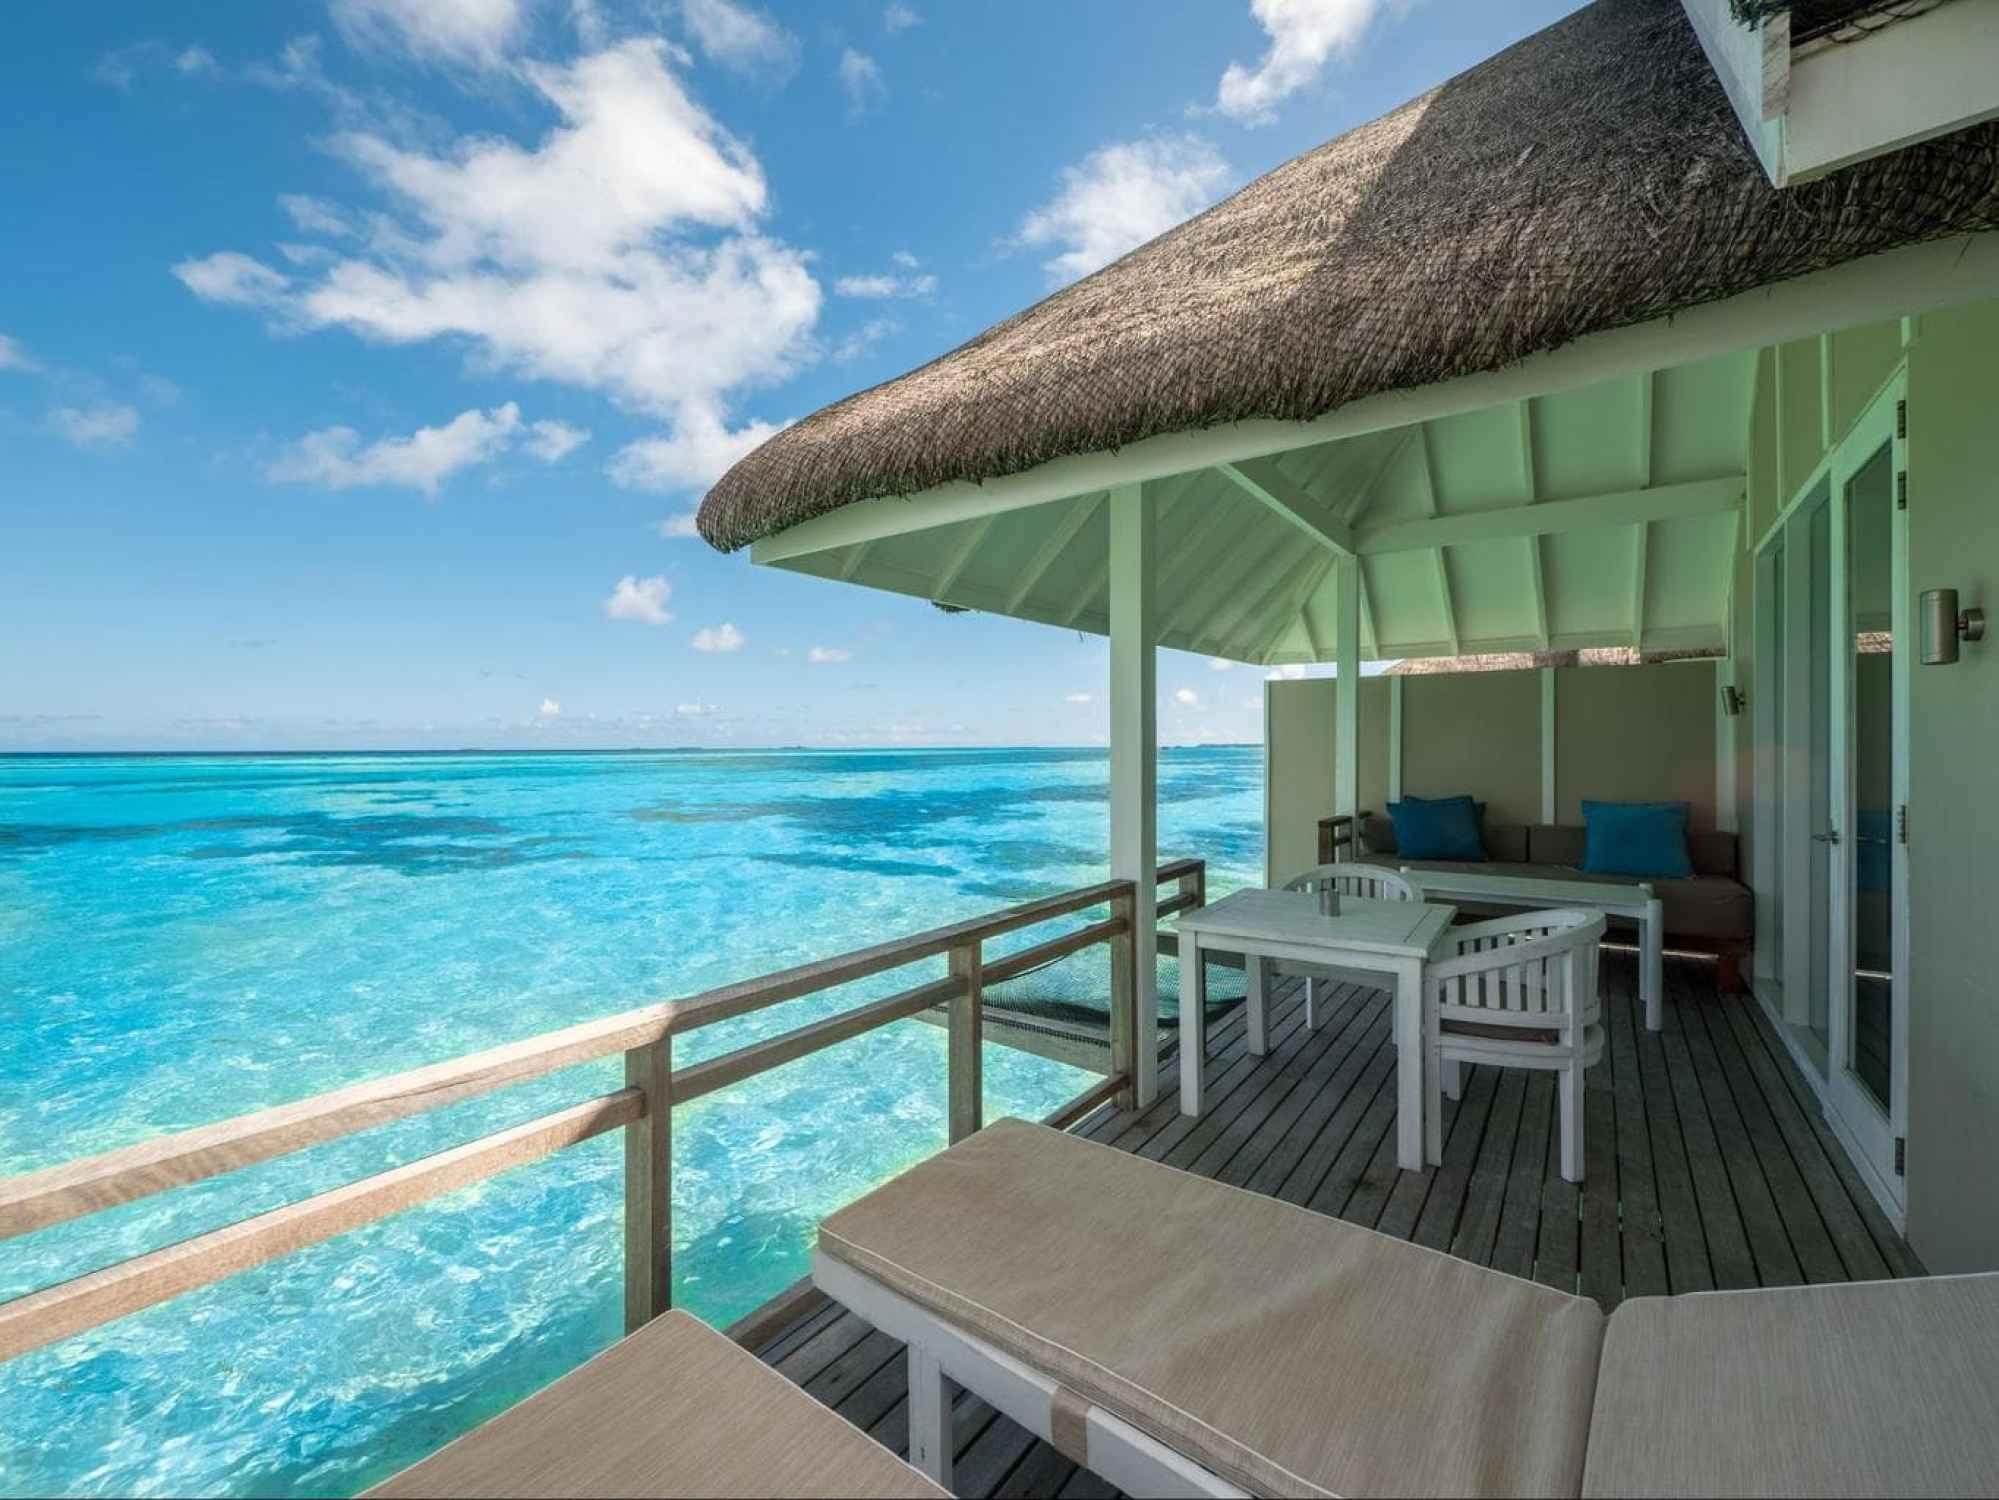 Outdoor deck at LUX* Maldives South Ari Atoll